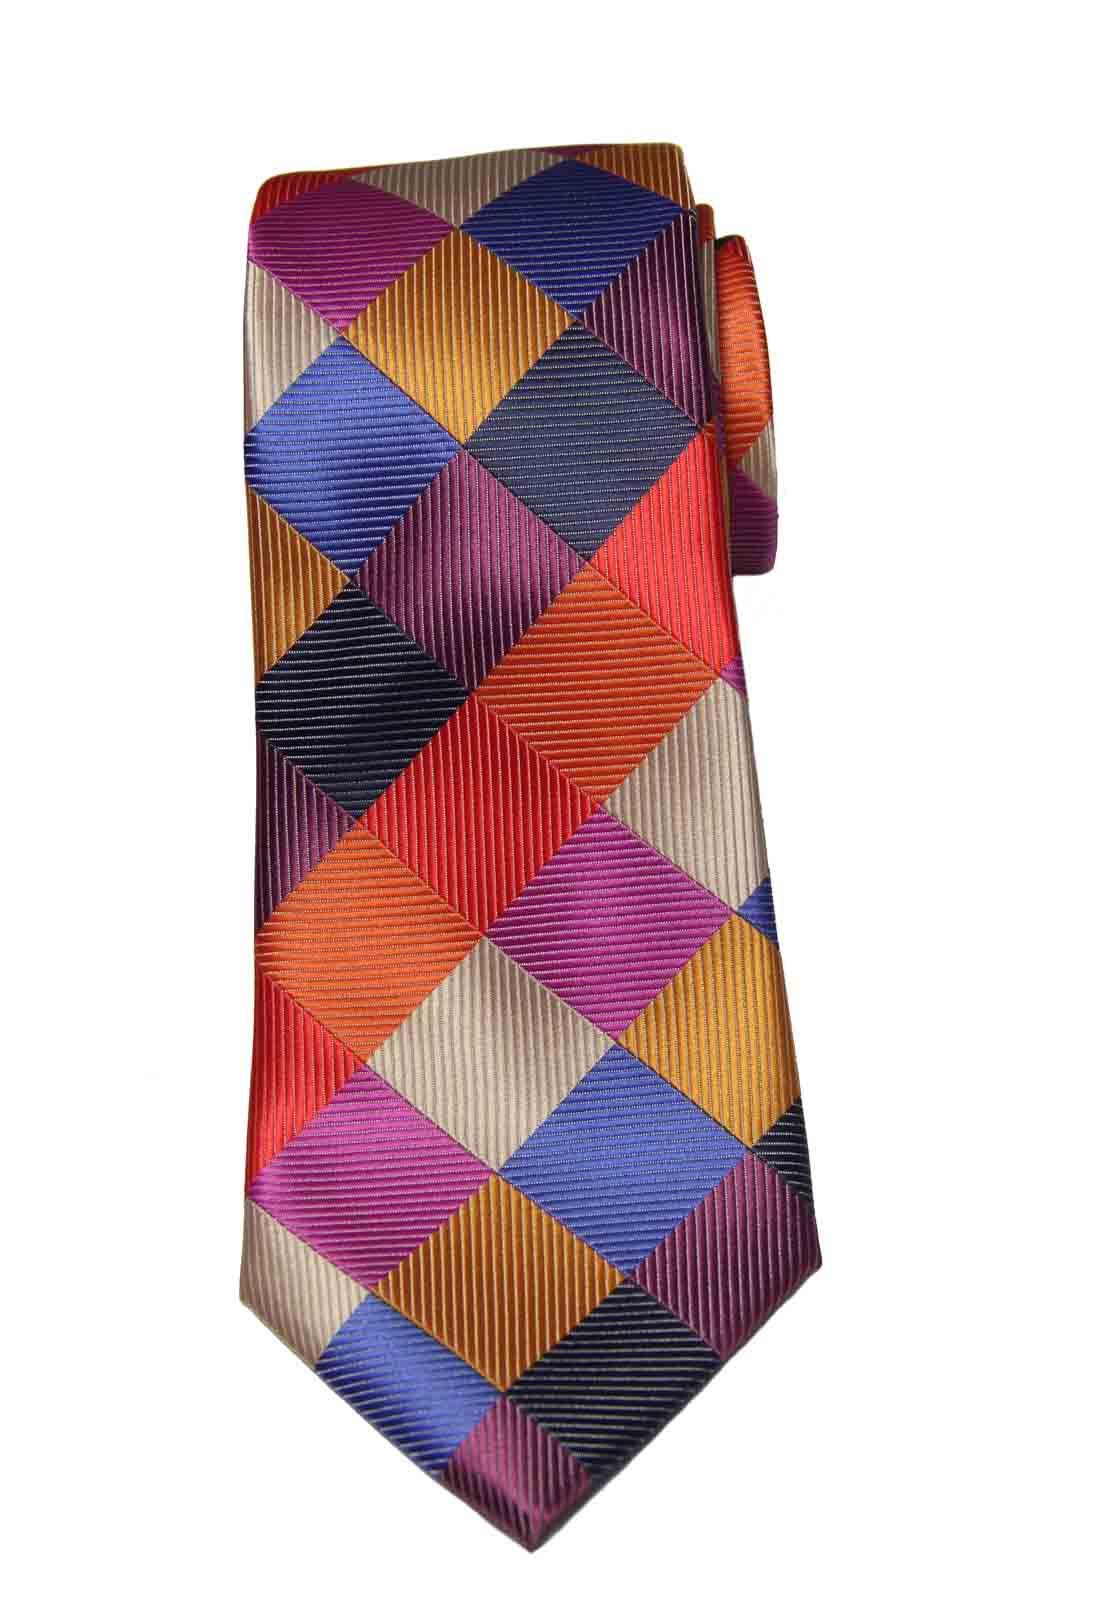 Gascoigne Silk Tie Multi-color Geometric Hand Tailored Men's